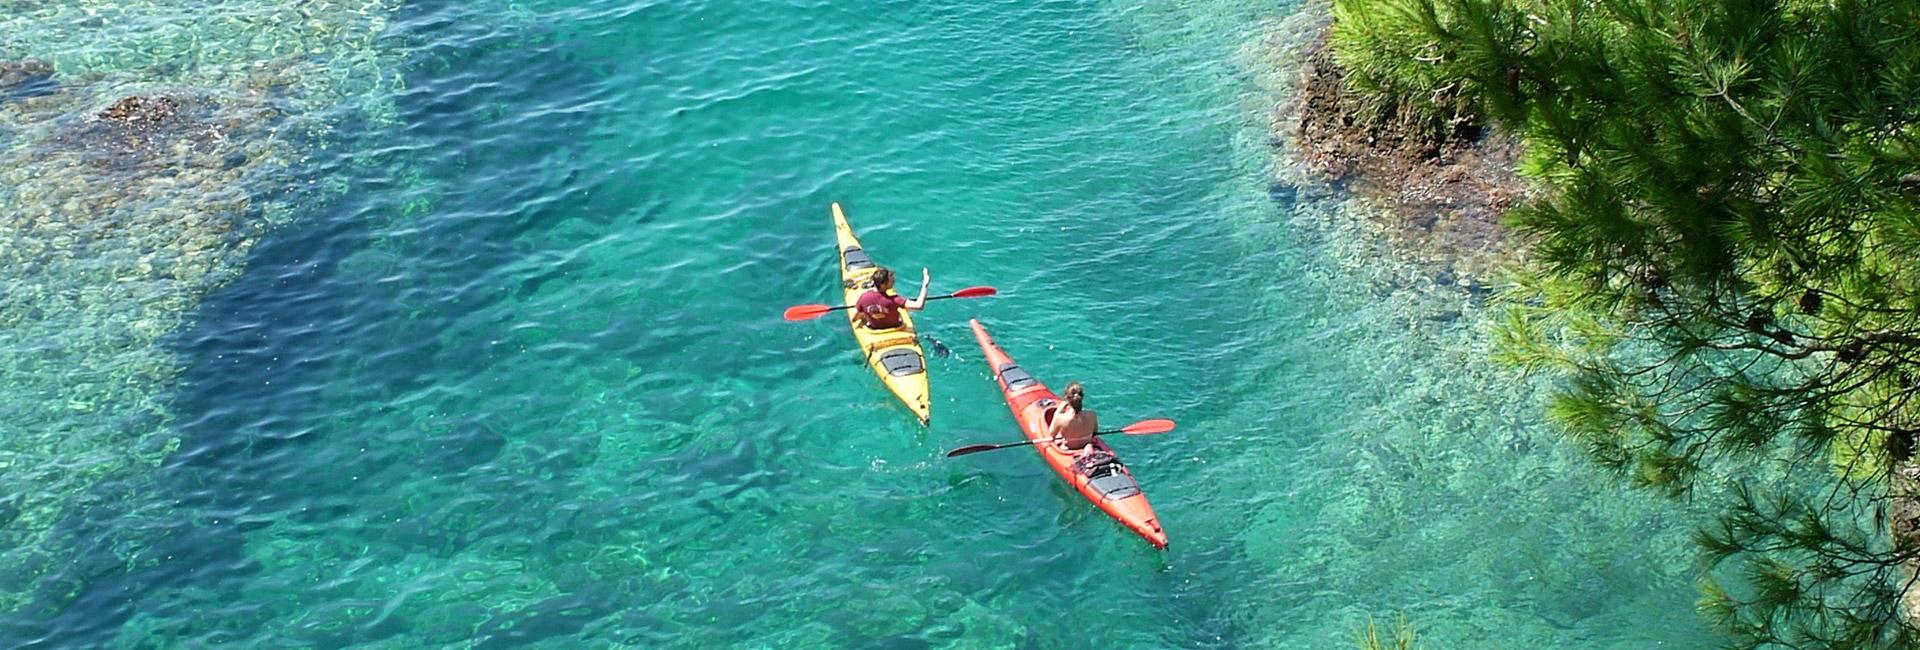 Rovinj Islands Sea Kayaking